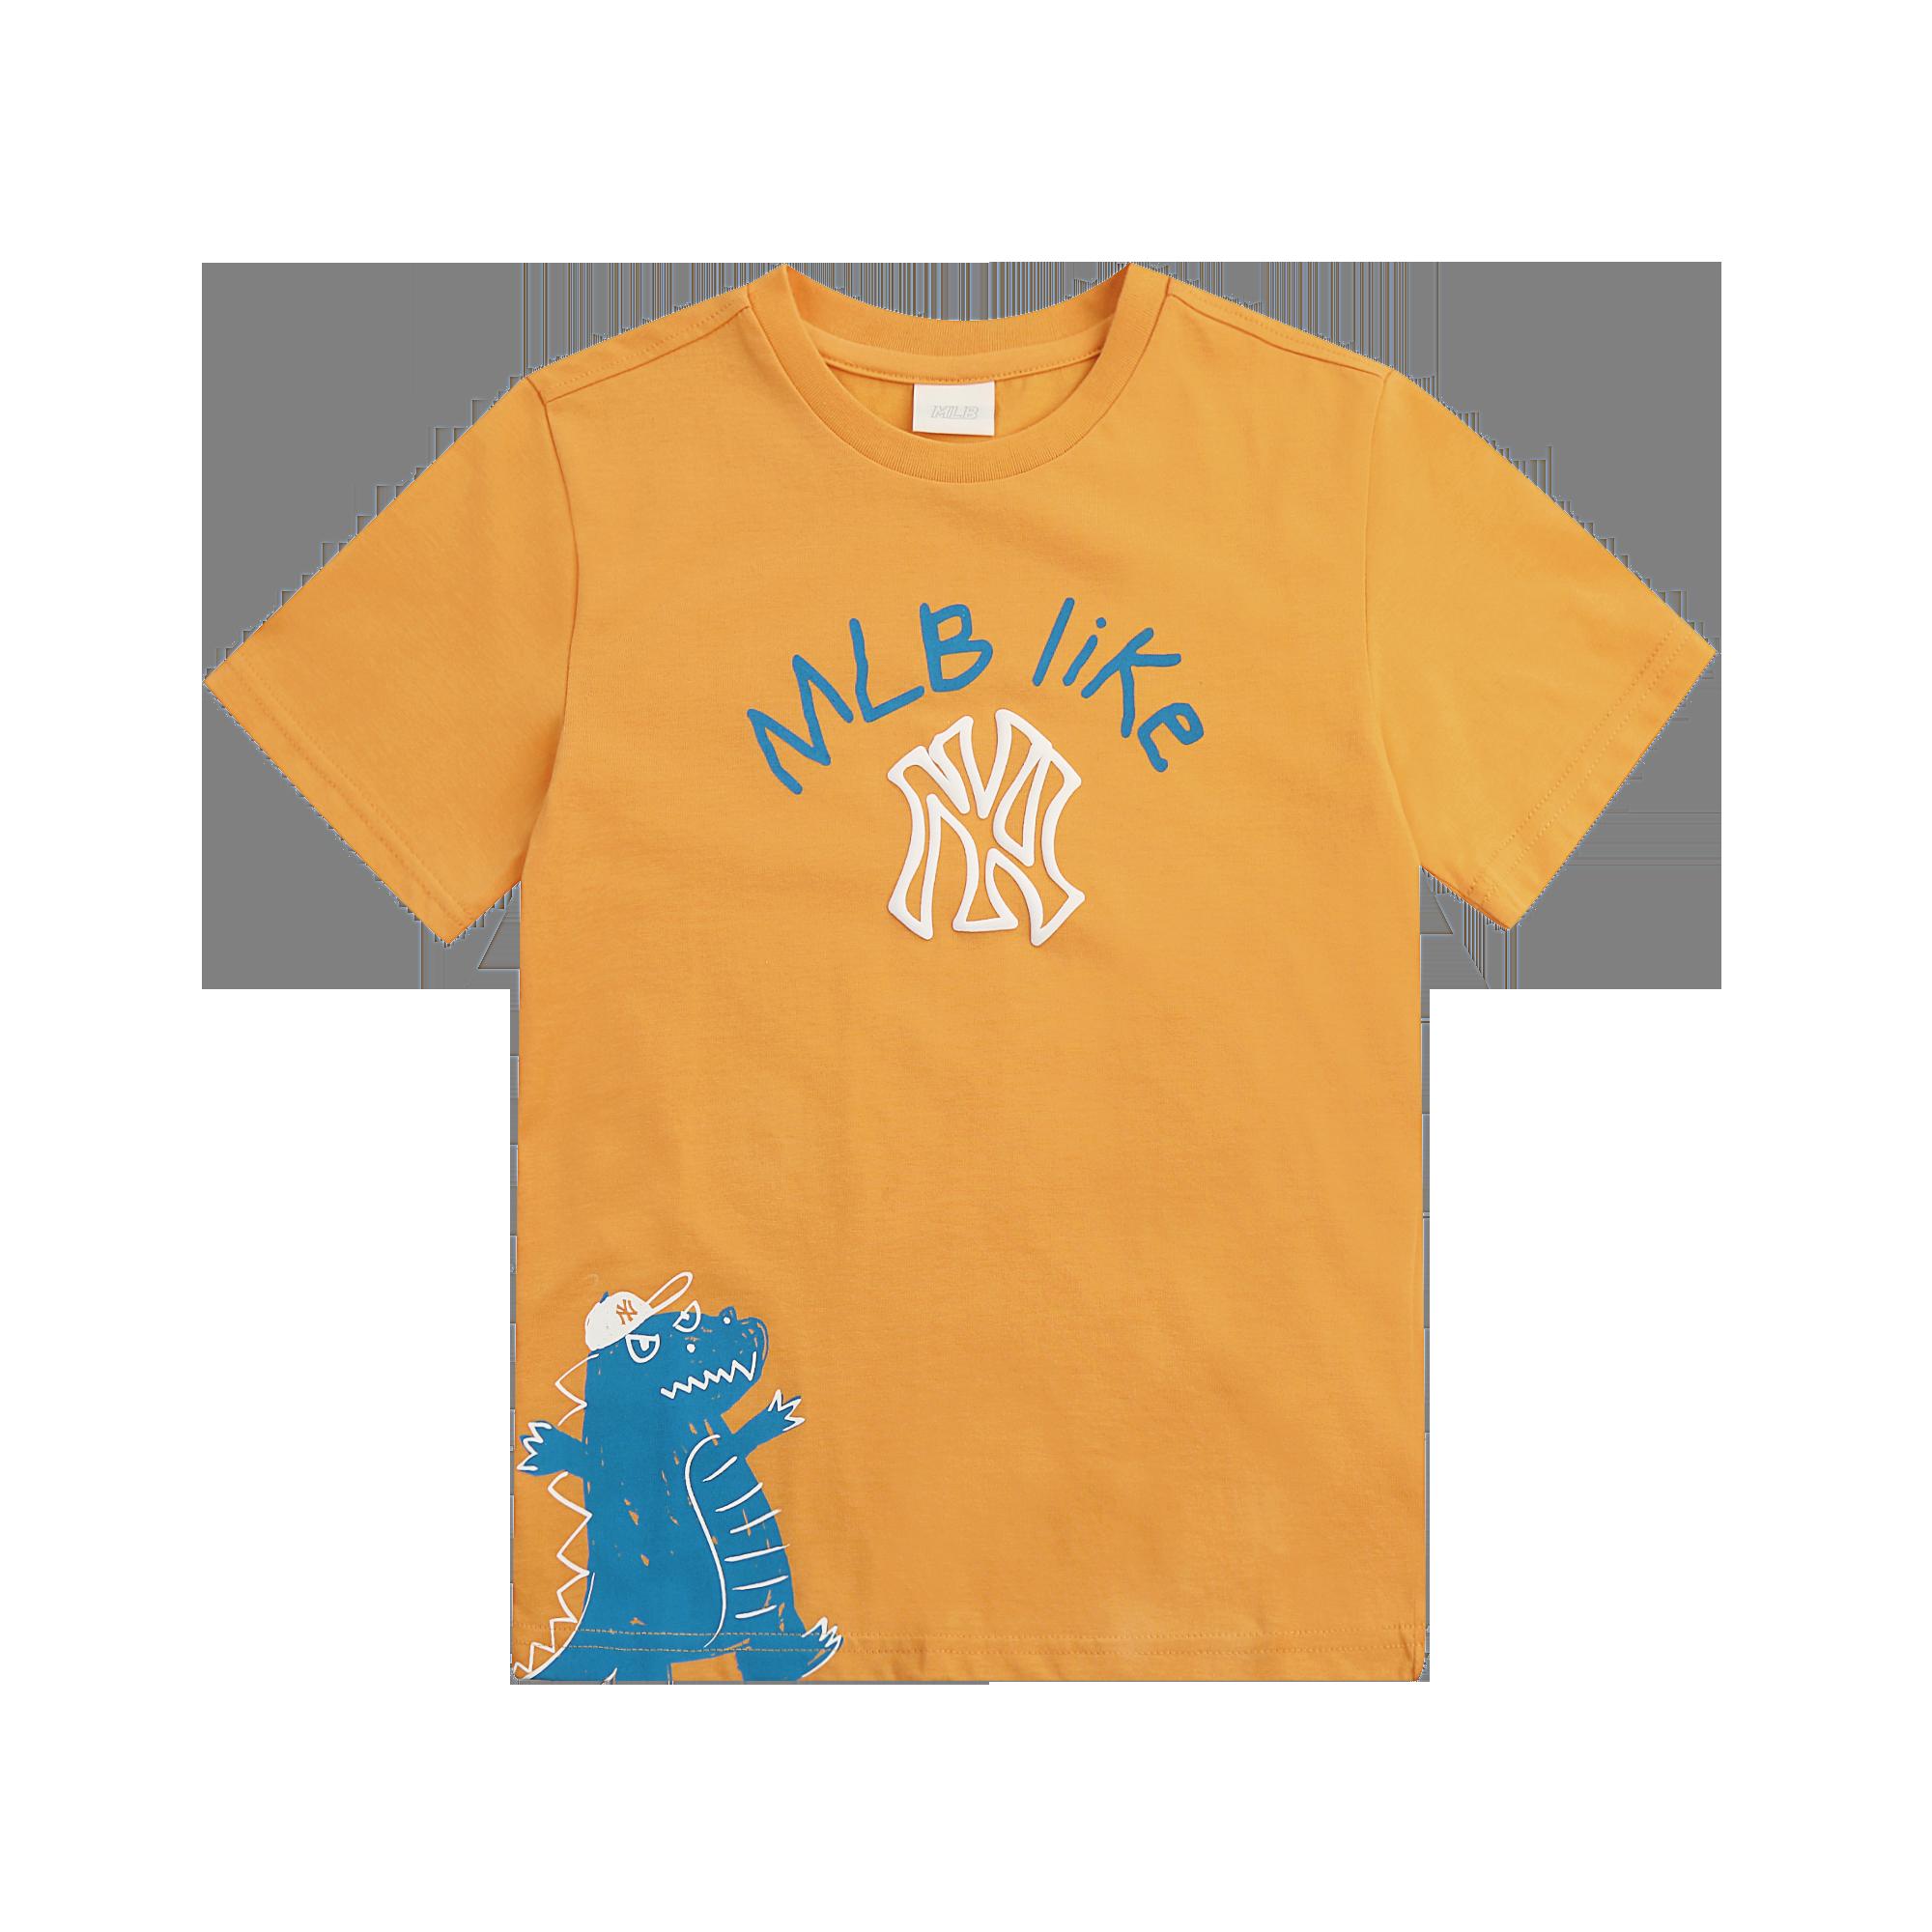 MLB LIKE 키노 티셔츠 뉴욕양키스